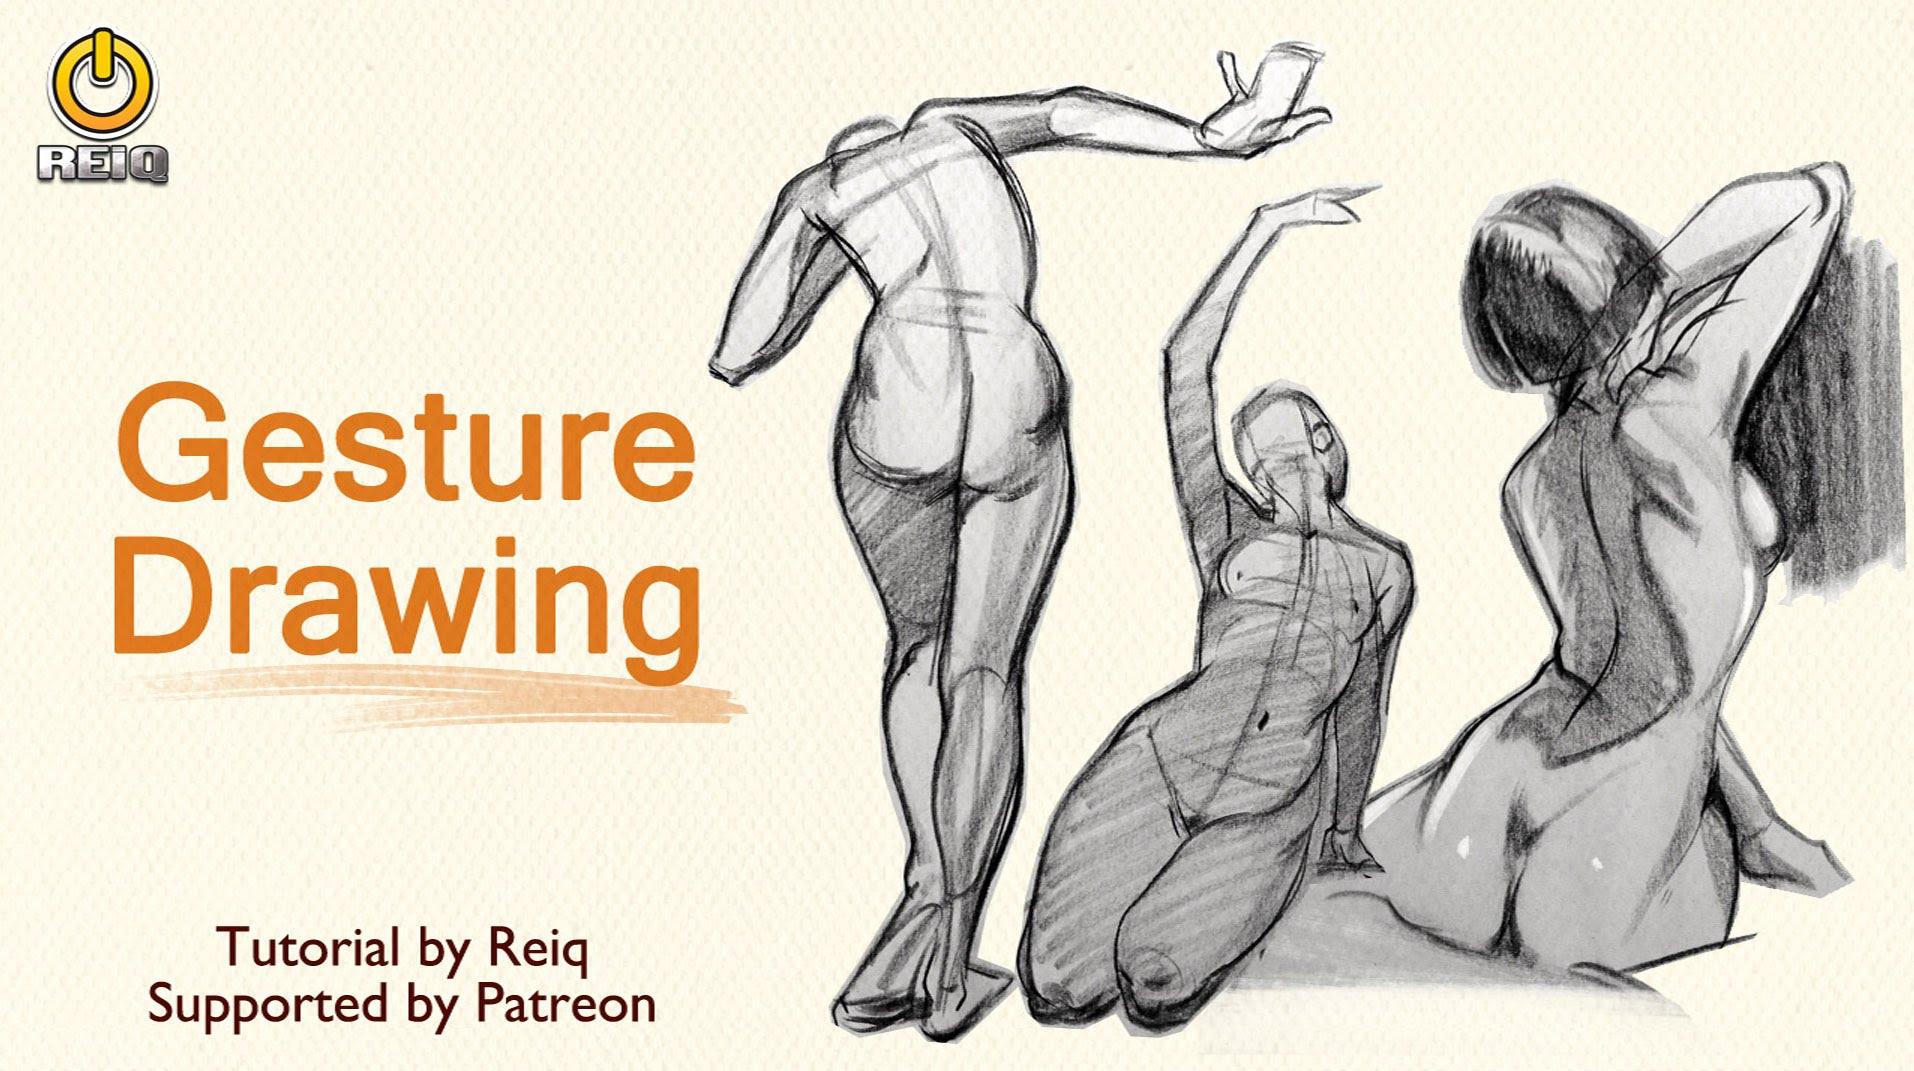 1914x1071 Gesture Drawing Tutorial By Reiq